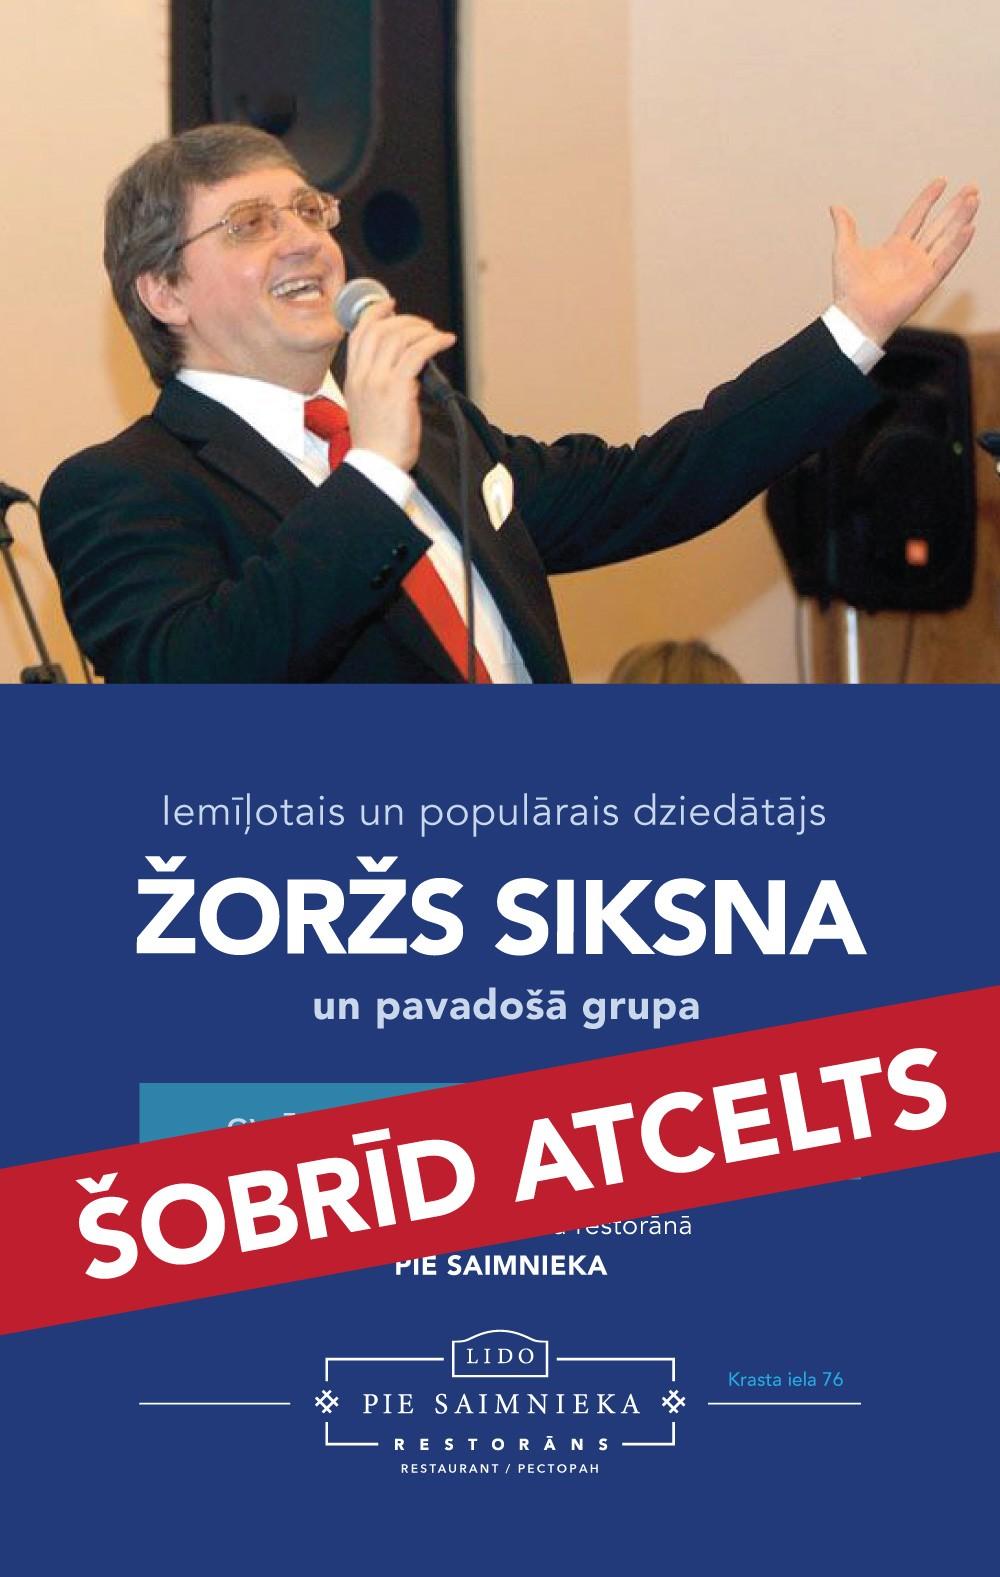 Zorzs-Siksna-Svetdienas-WEBAM-ATCELTS.jpg